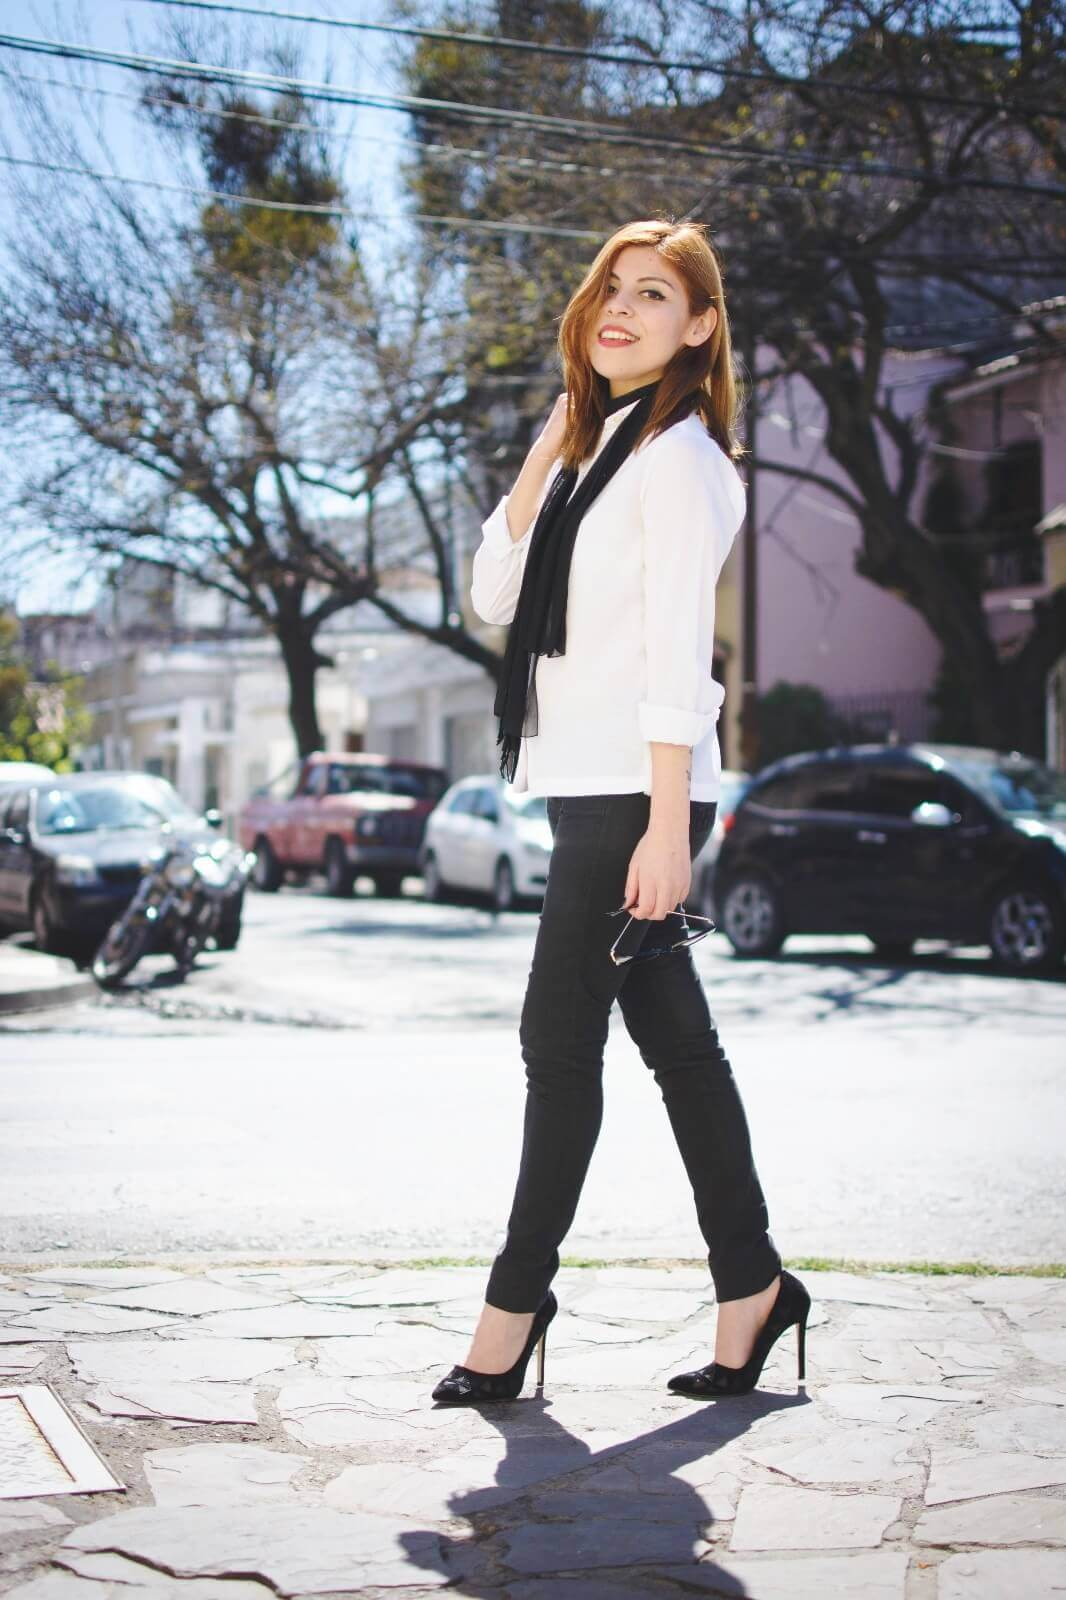 white-shirt-skinny-scarf-black-jeans-zaful-black-suede-shoes-deborah-ferrero-style-by-deb07